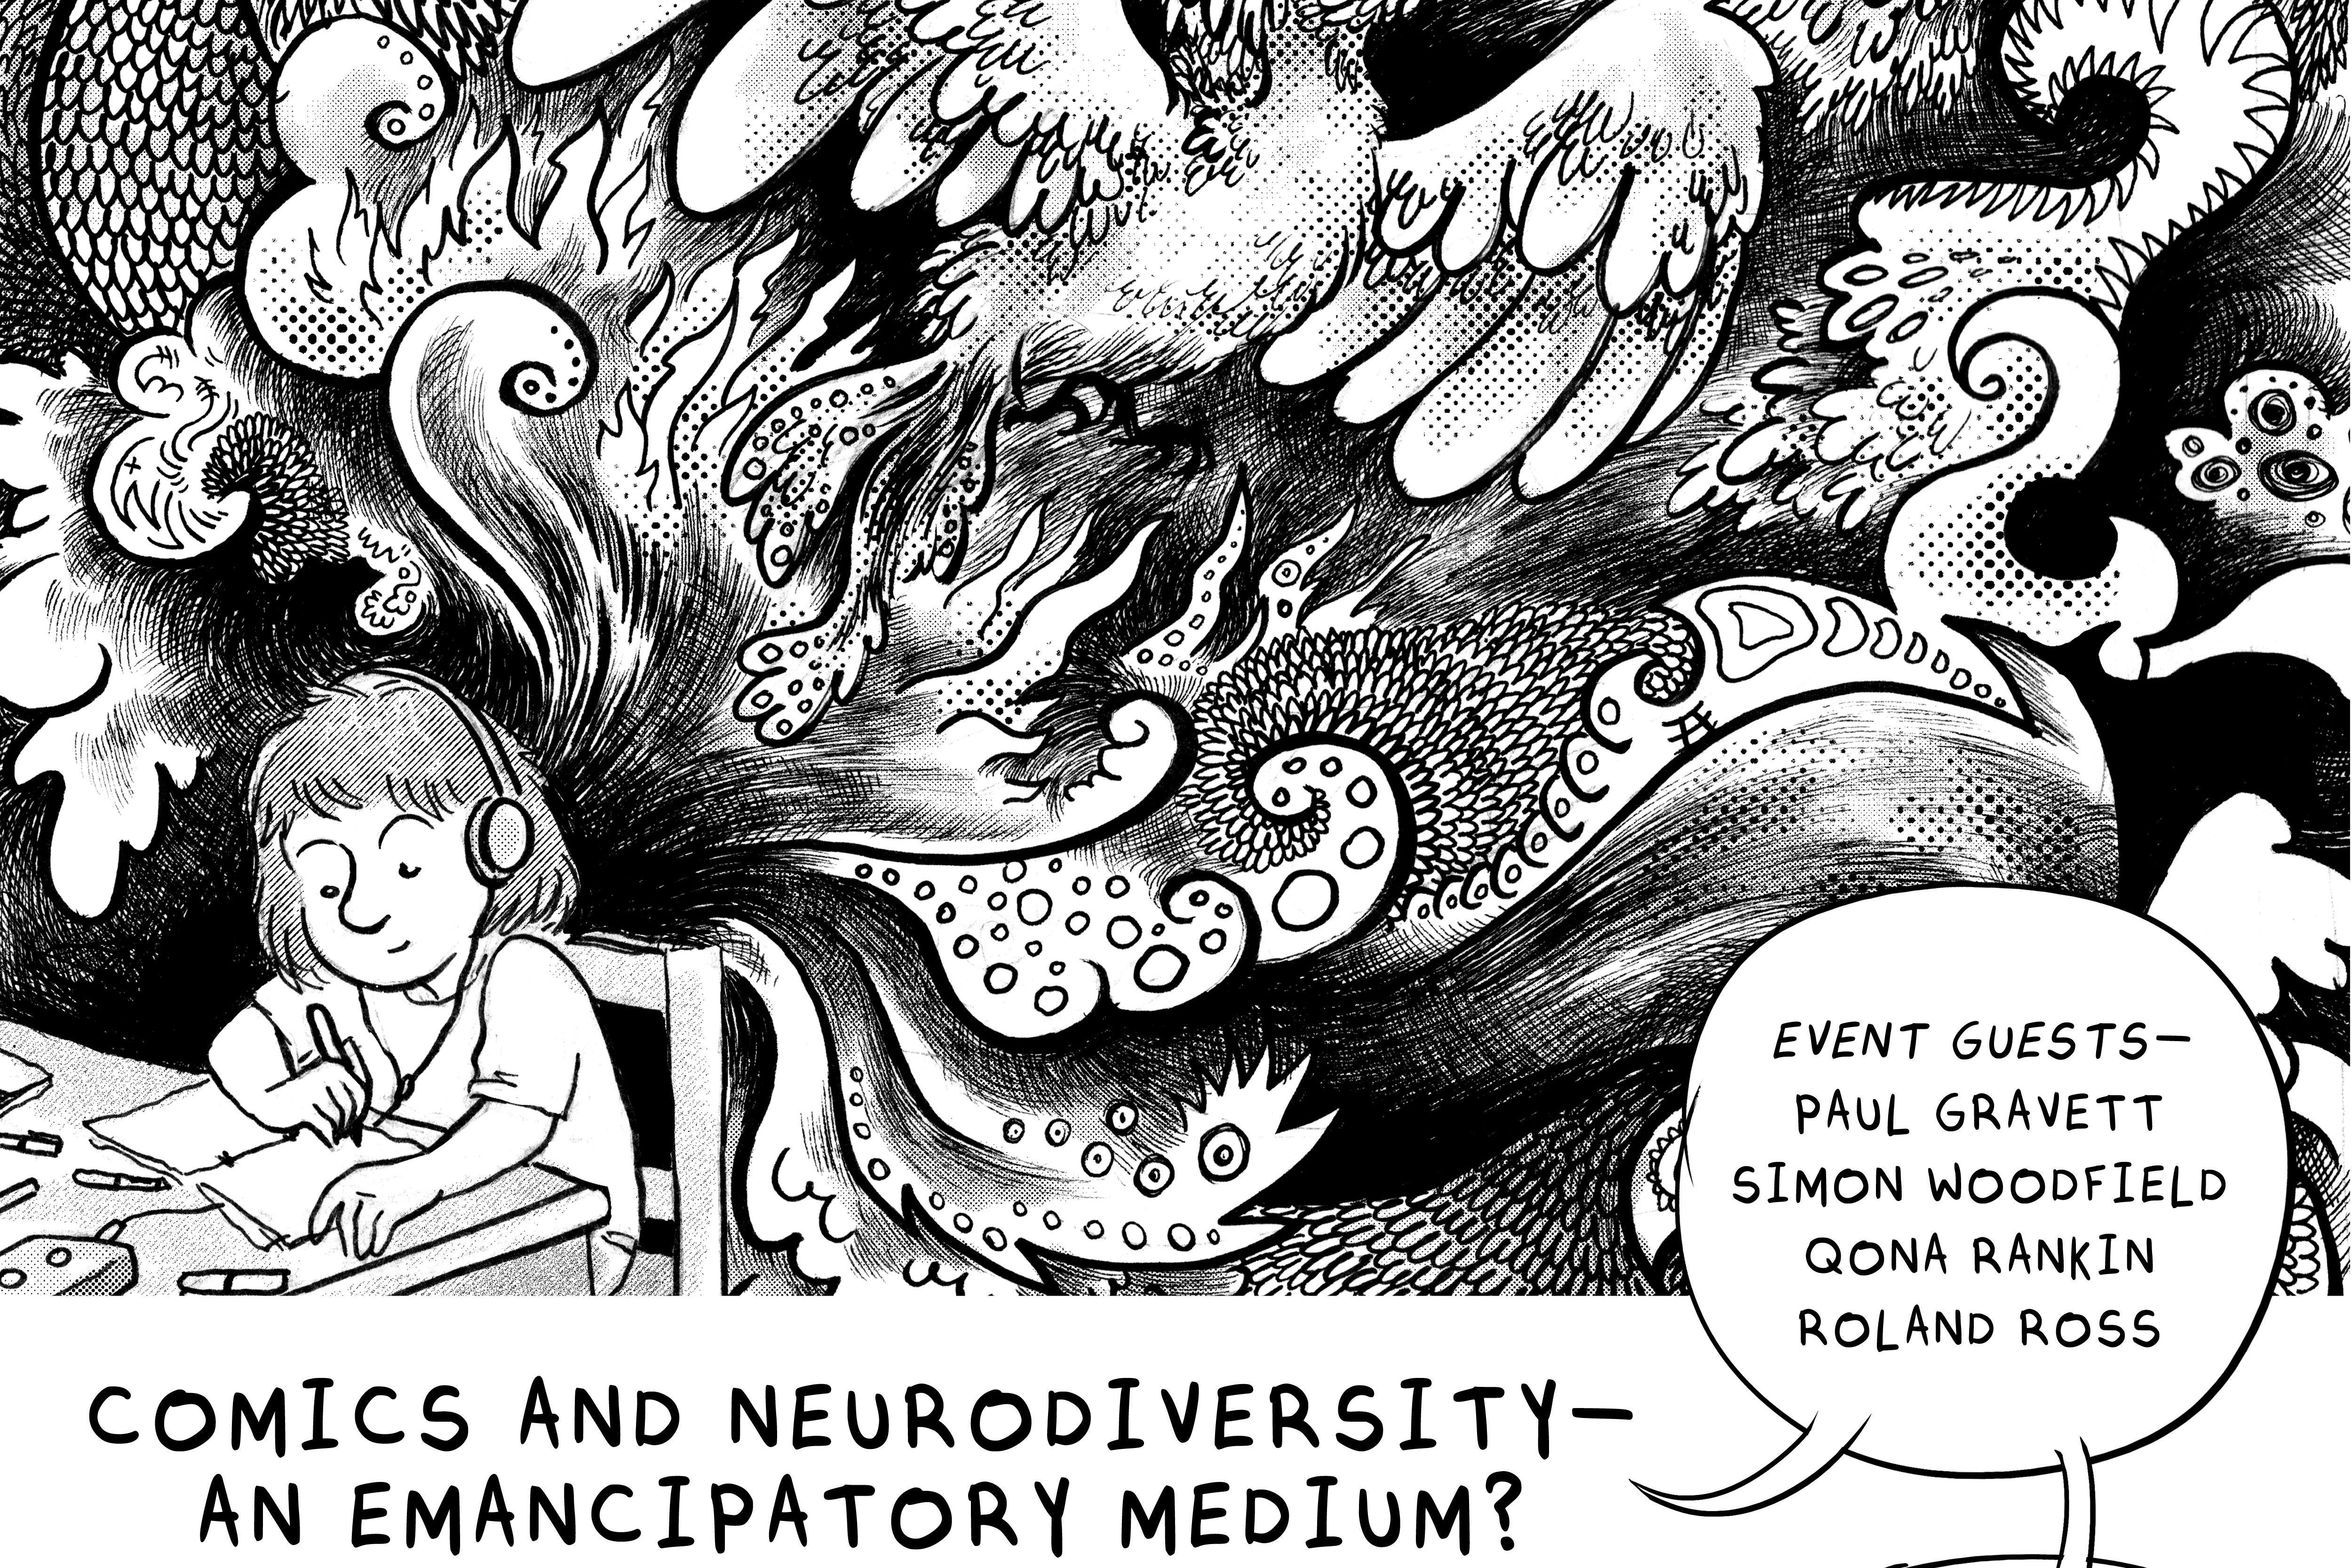 Comics and Neurodiversity: The Emancipatory Medium-image